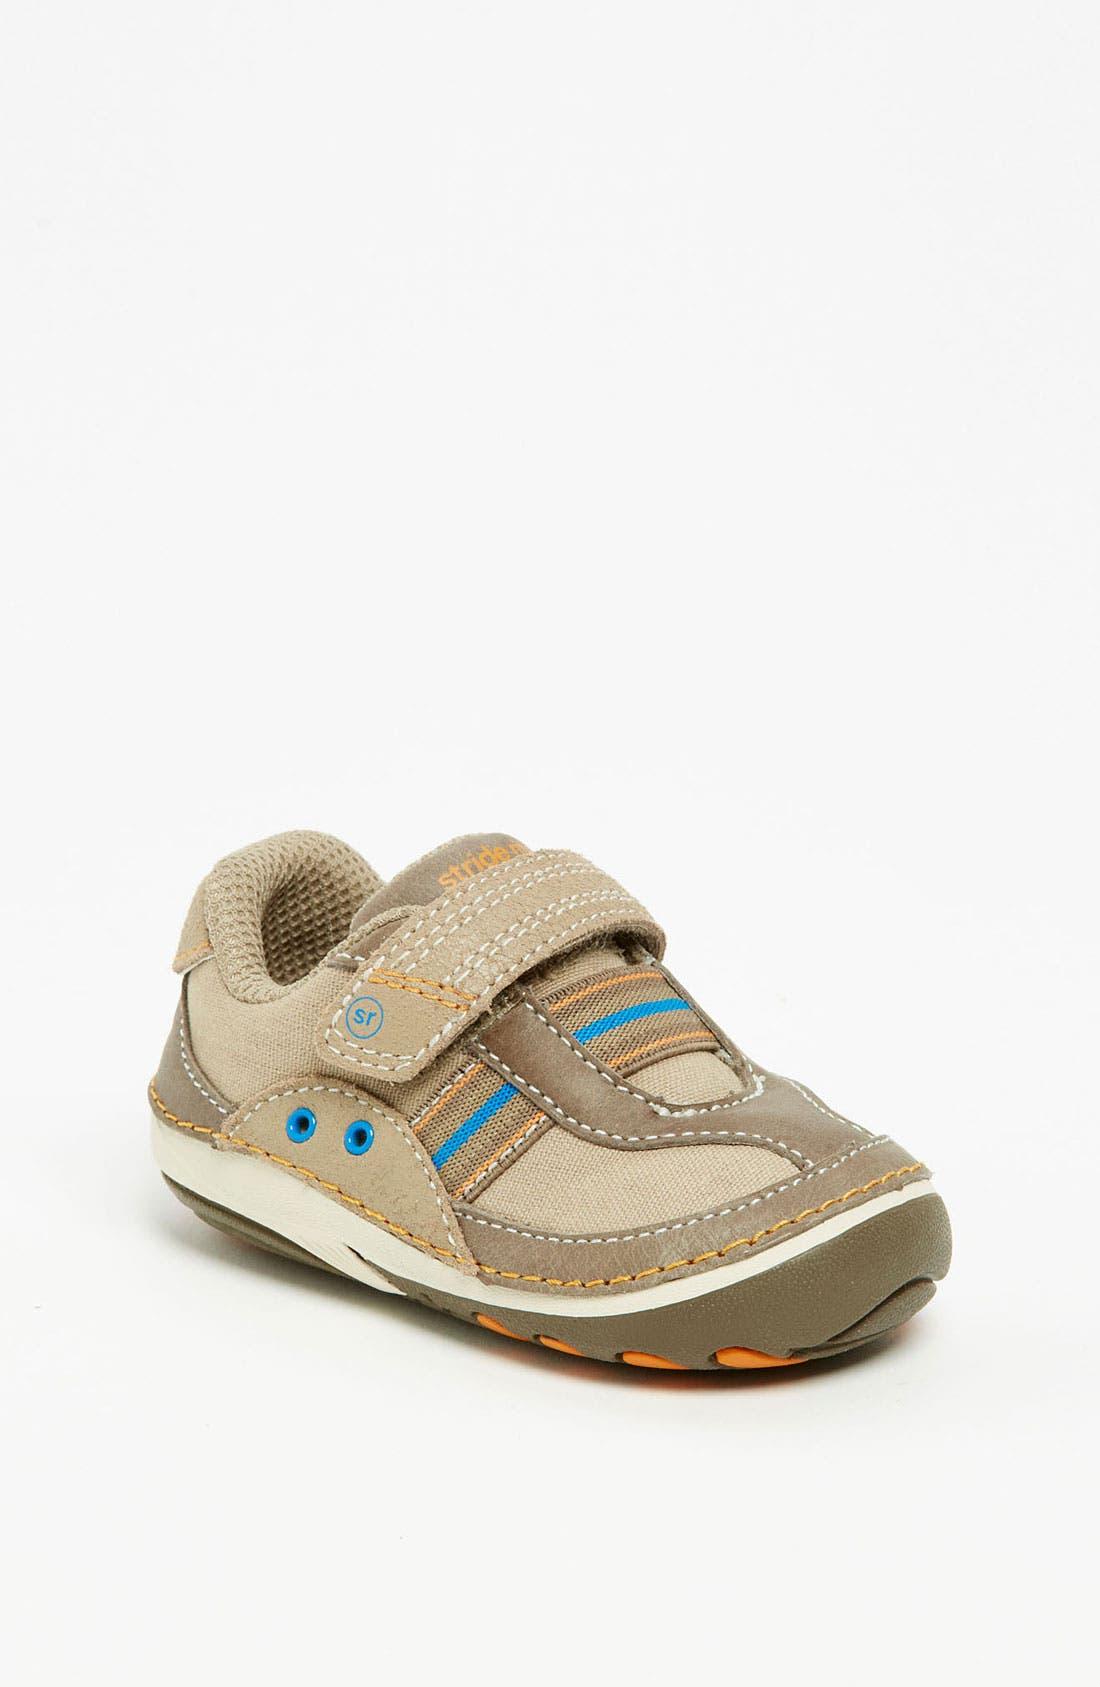 Main Image - Stride Rite 'Dalton' Sneaker (Baby & Walker)